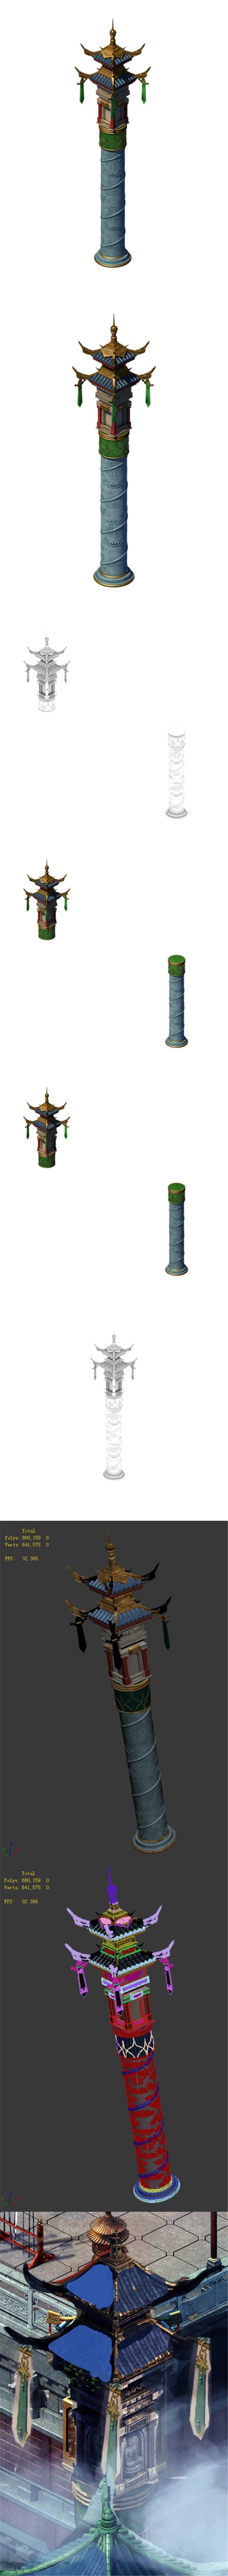 Building - contest ring - decorative column - 3DOcean Item for Sale